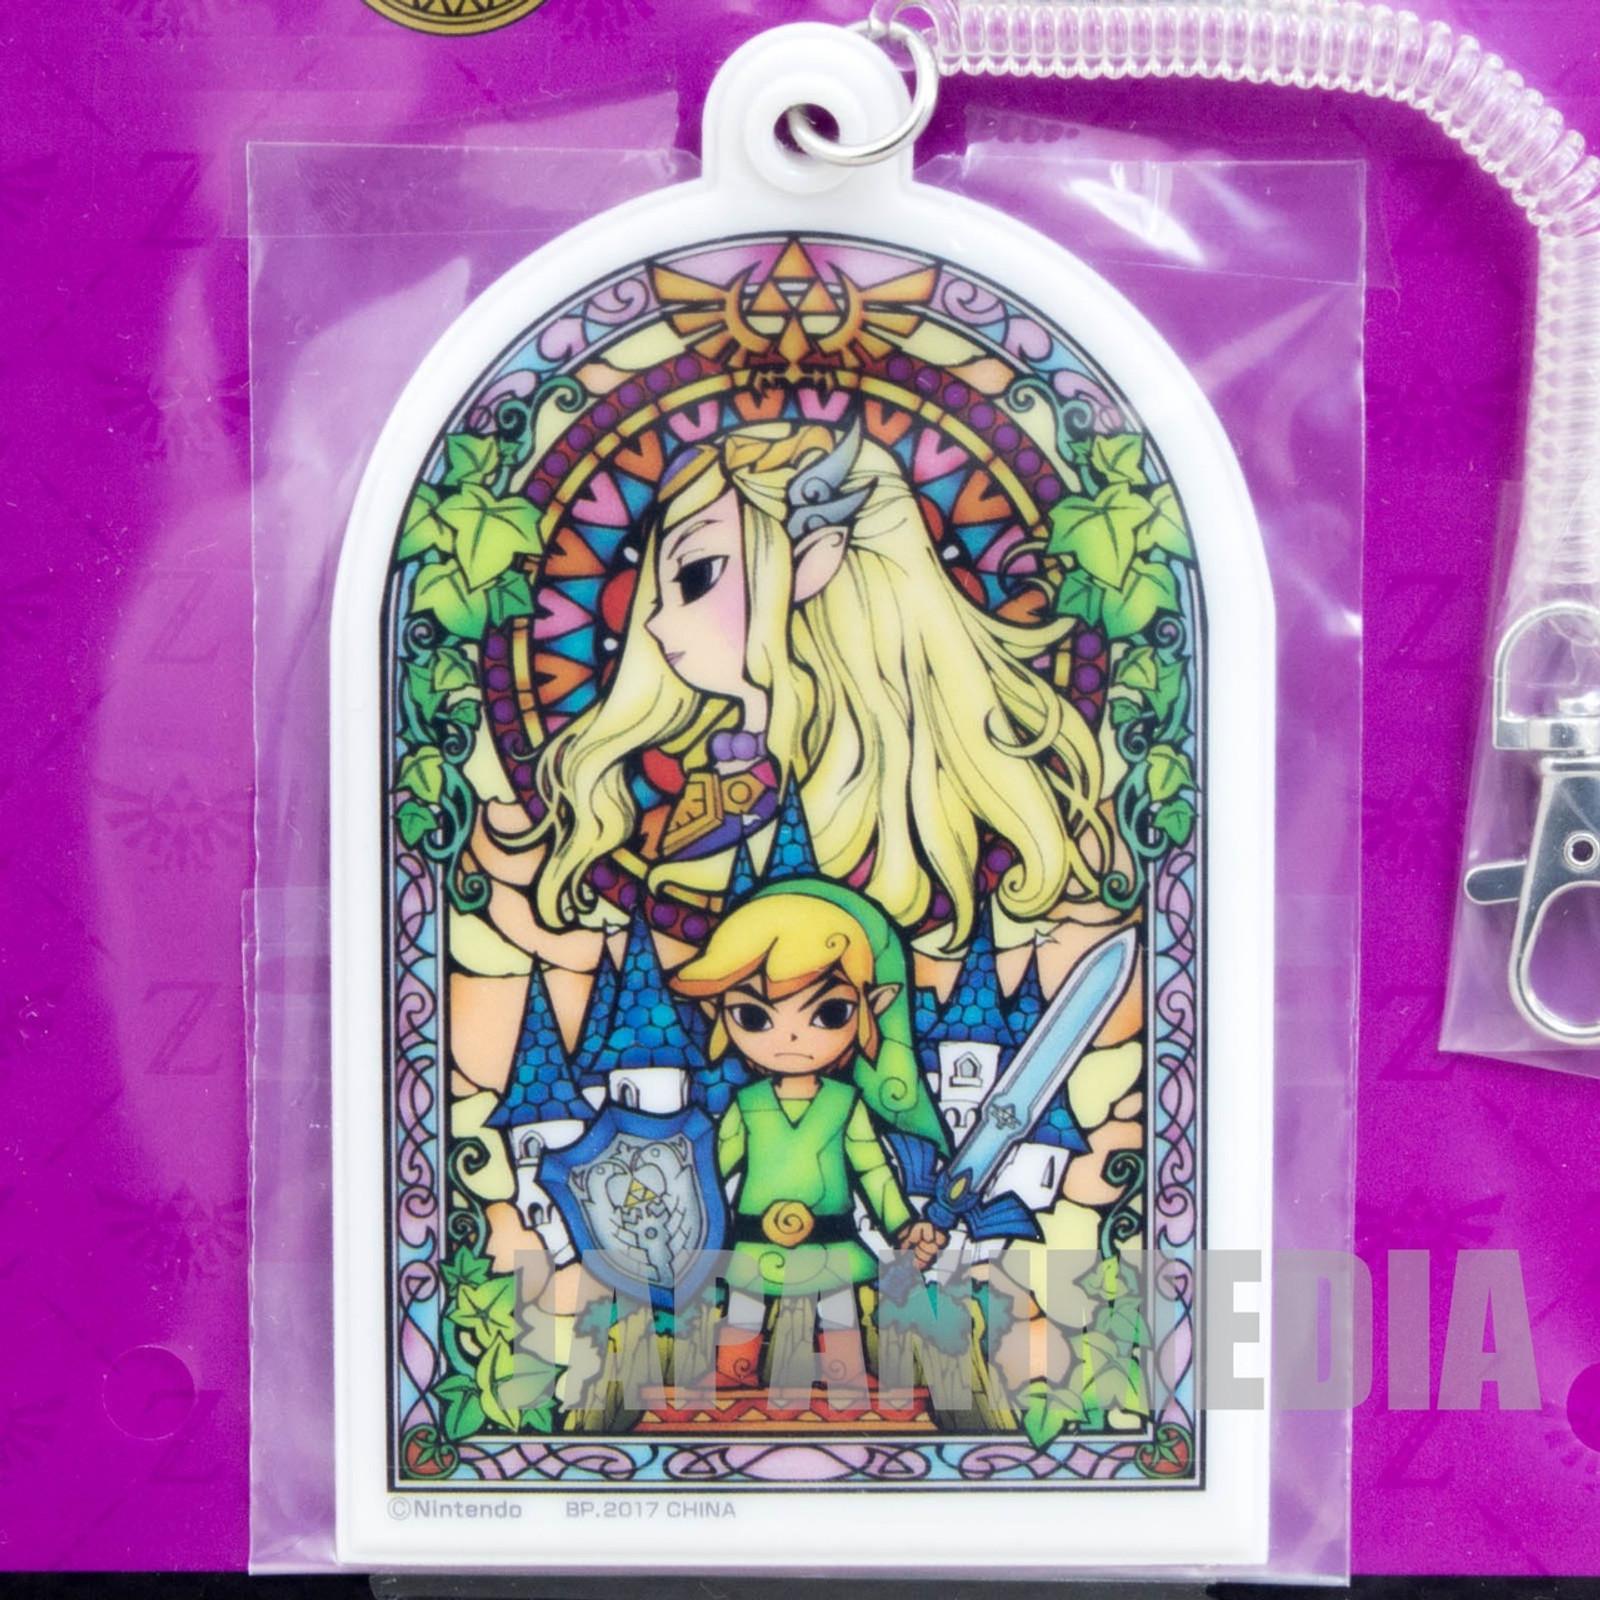 Legend of Zelda Card Case Strap Banpresto JAPAN FAMICOM NES NINTENDO 2